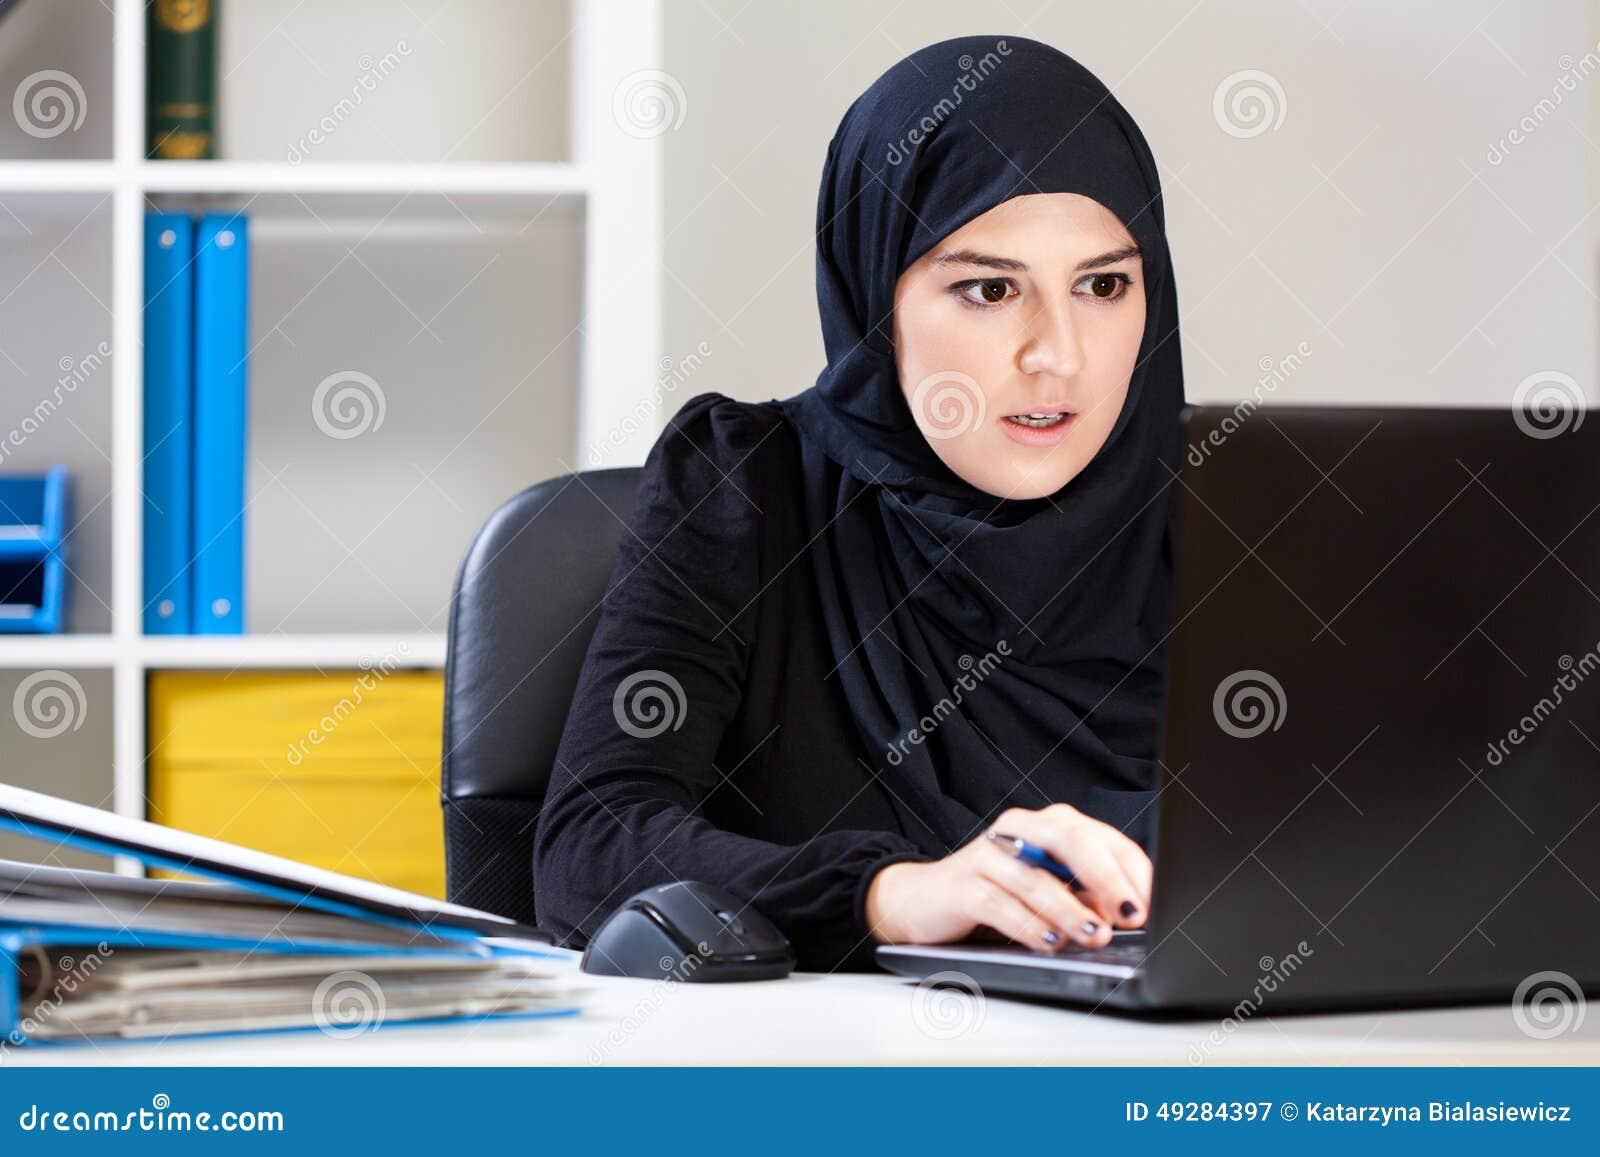 Muslim Woman Working On Laptop Stock Photo Image 49284397